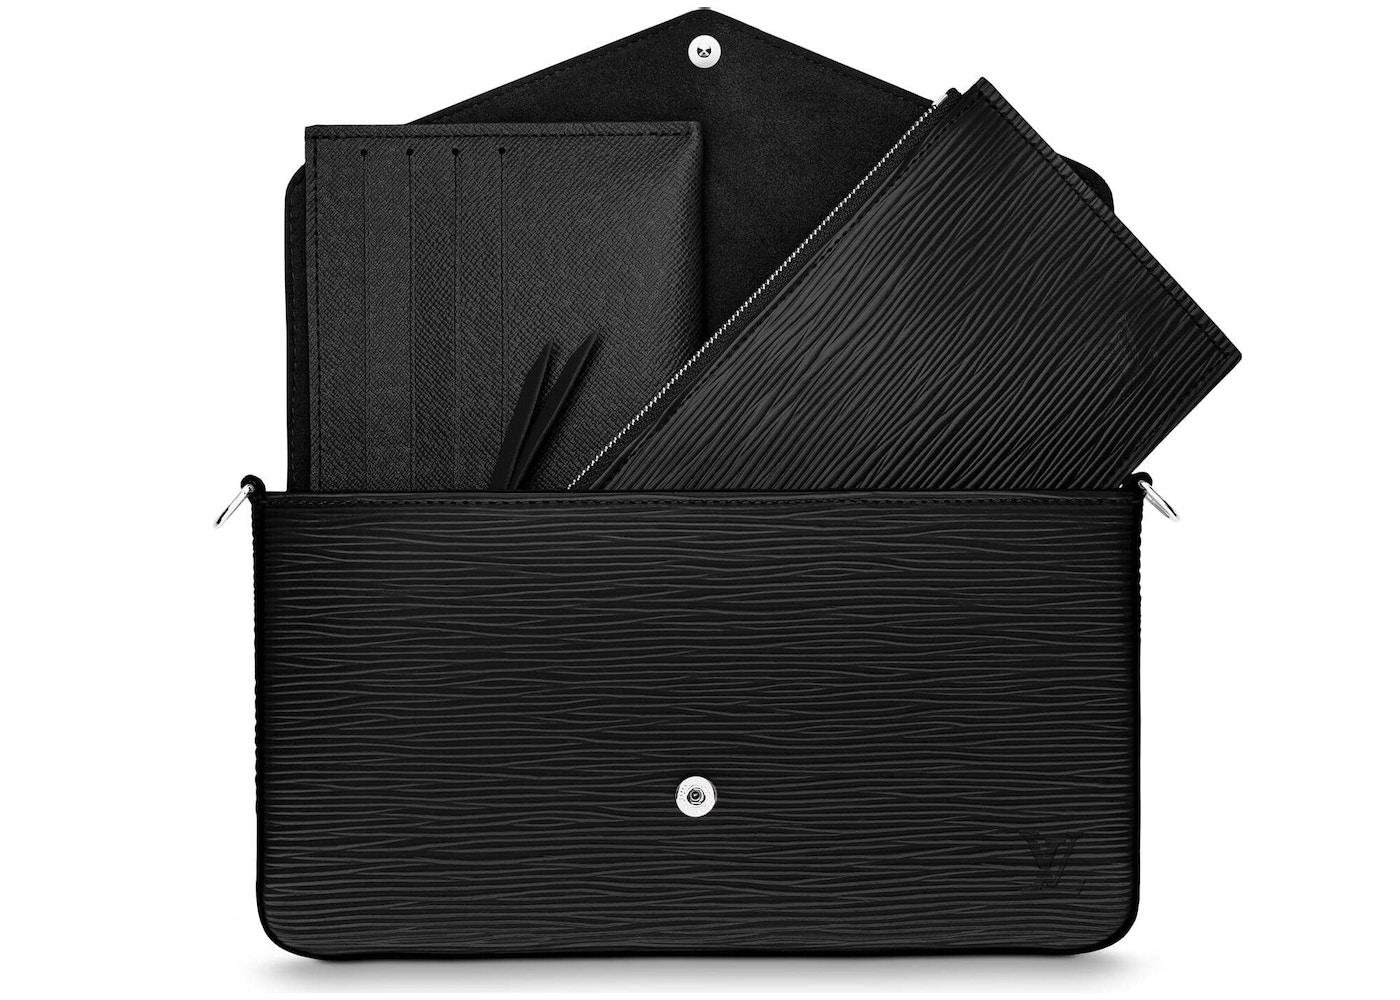 a4024f11ae1b Louis Vuitton Pochette Felicie Epi With Accessories Noir